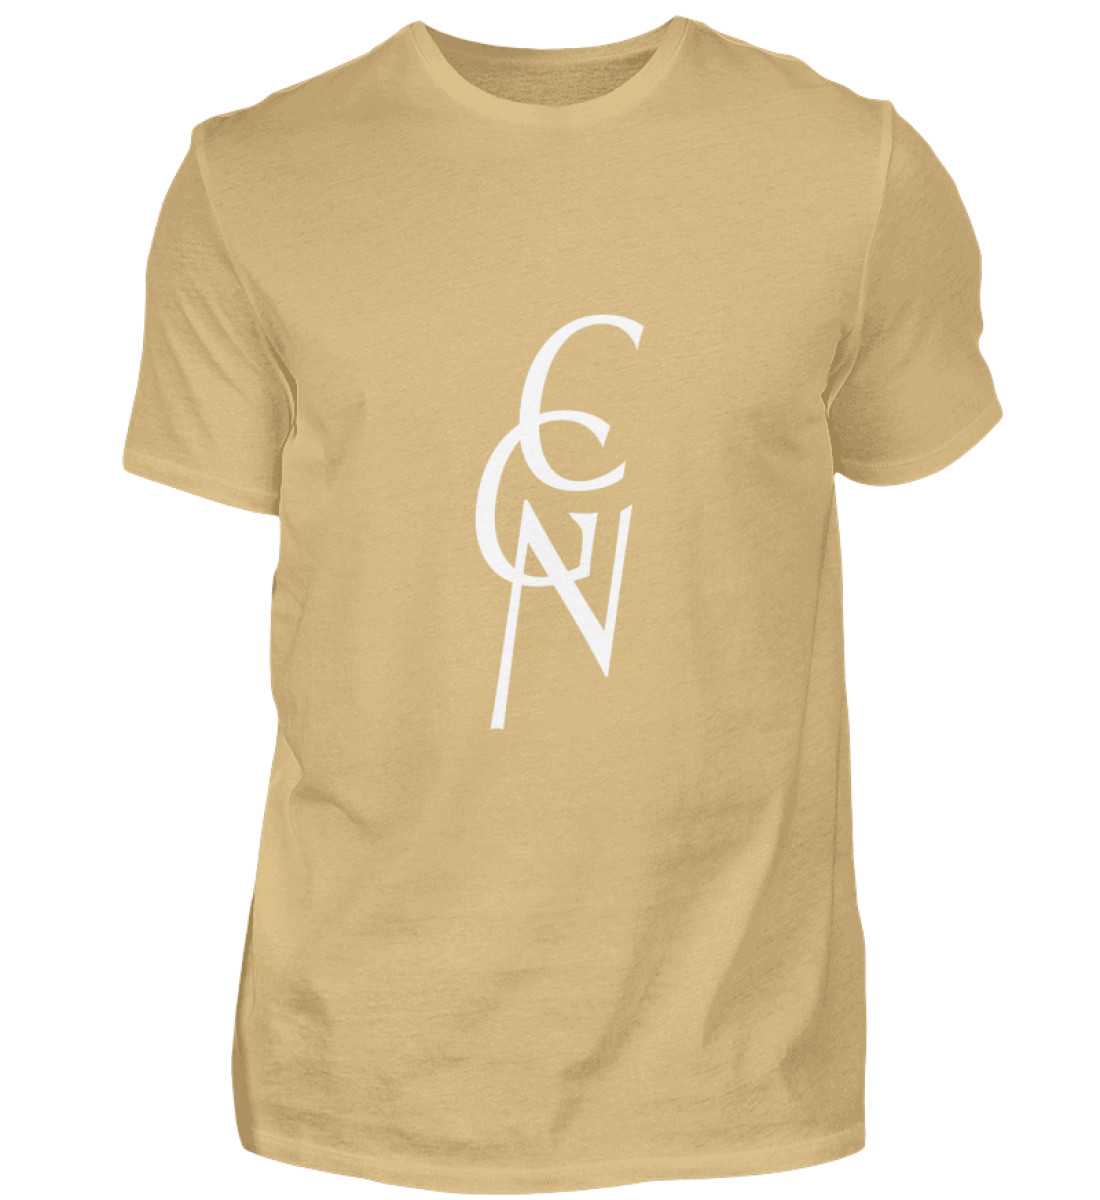 CGN - T-Shirt Herren - Herren Shirt-224